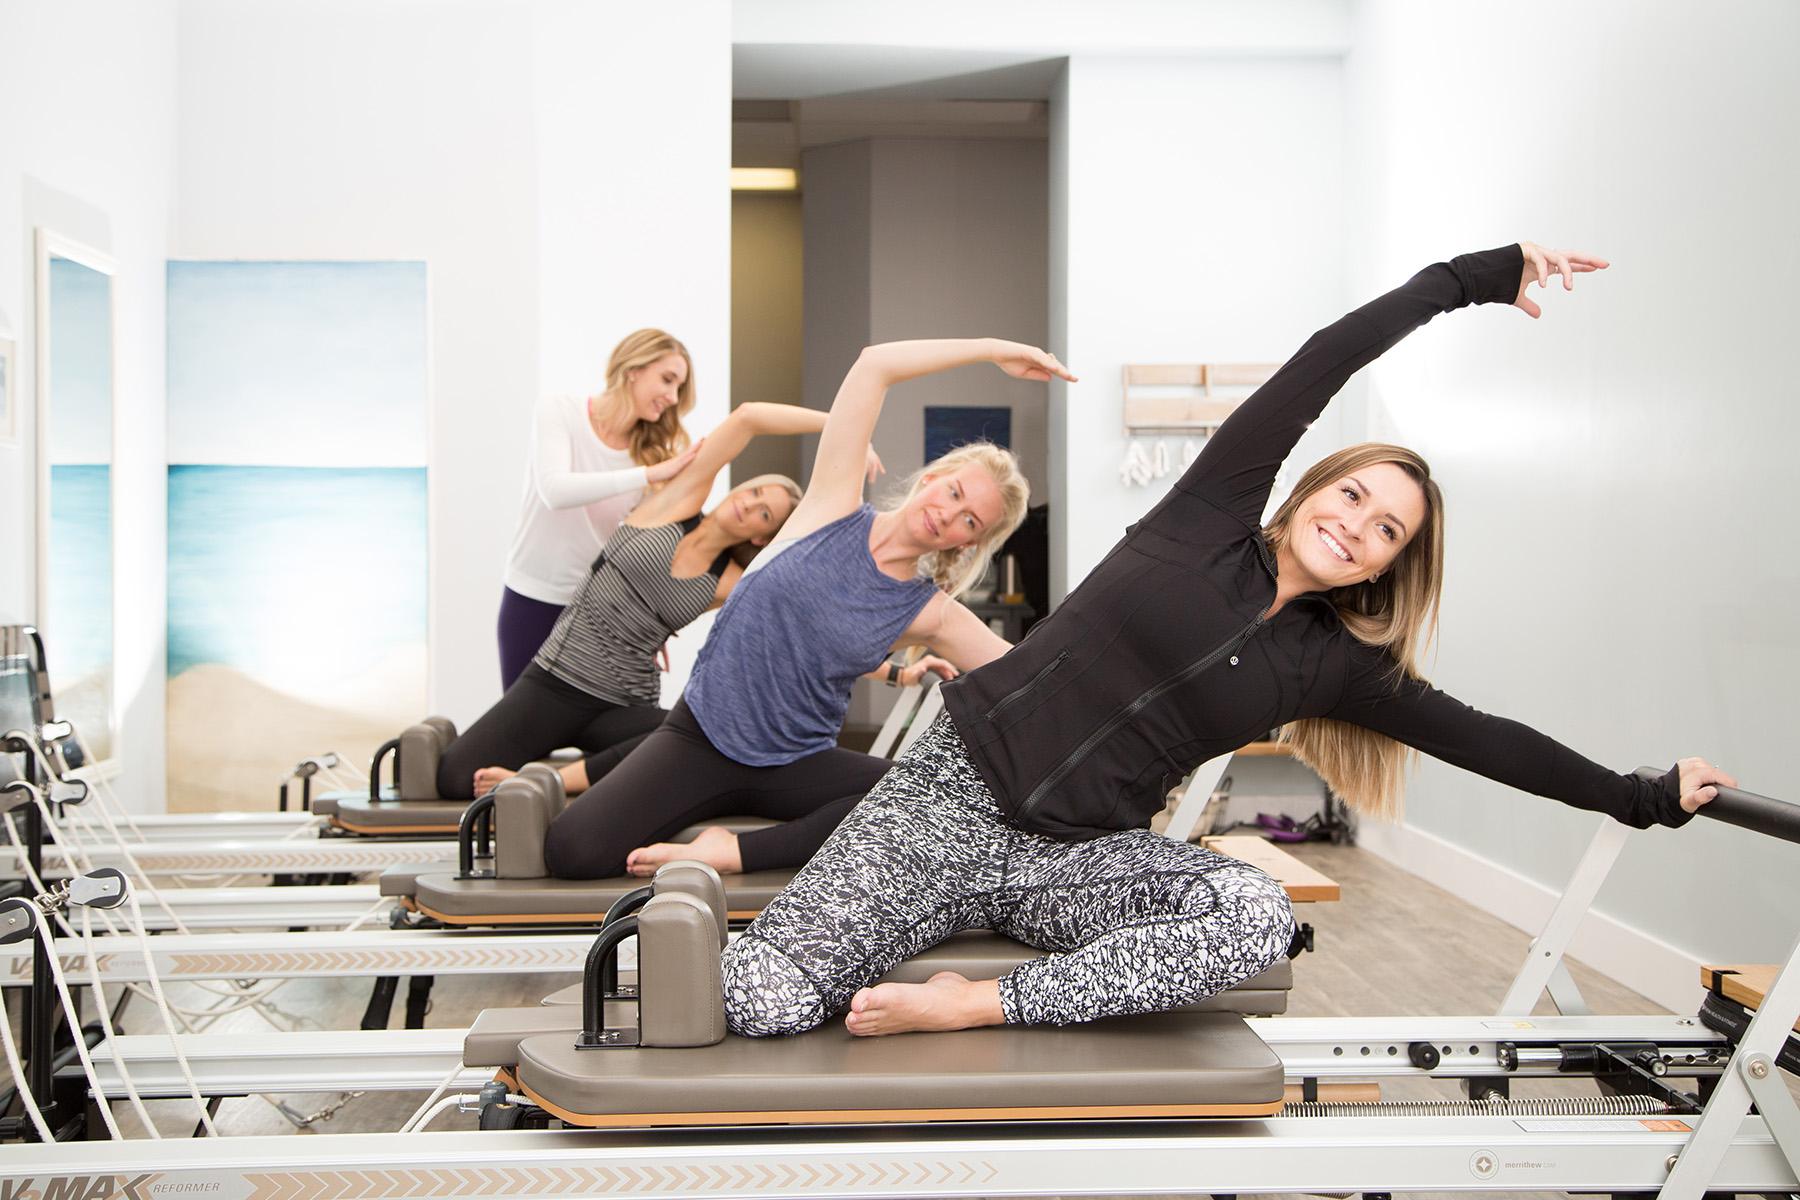 Active-Lifestyle-Photo-Shoot-Pilates-Instructor-Physiotherapist.jpg